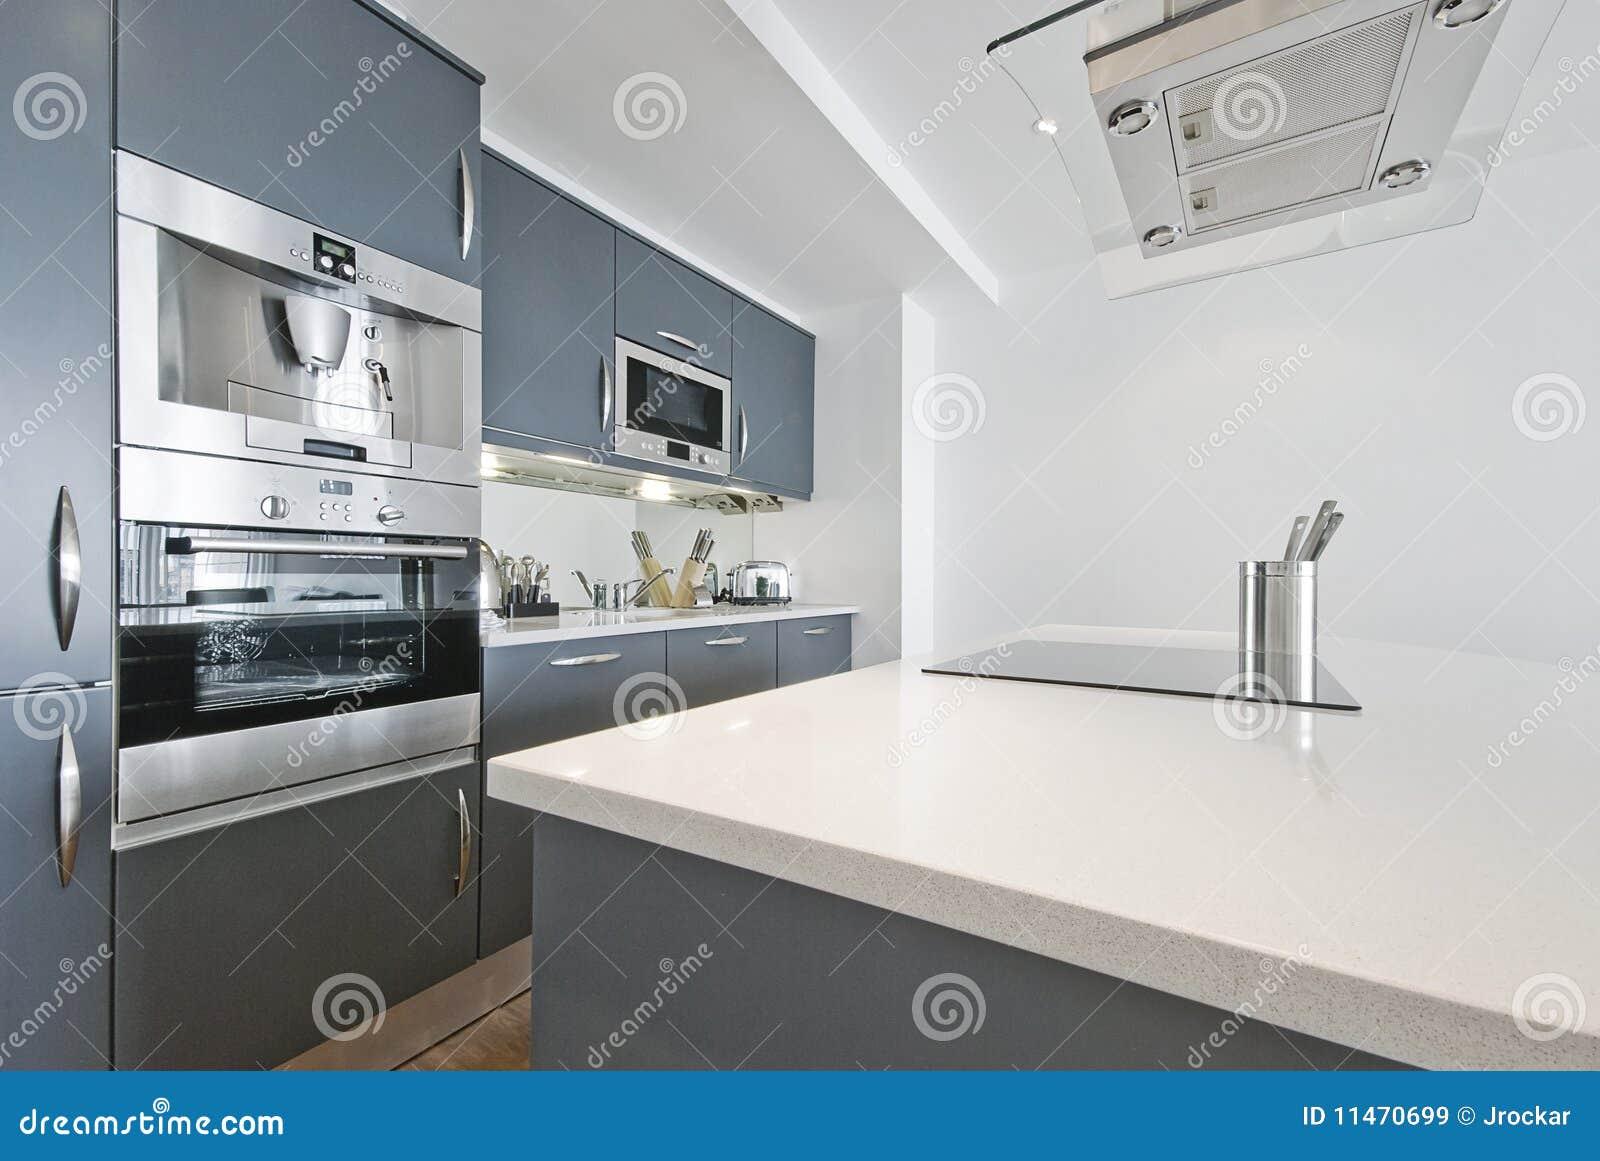 Ultra Moderne Keukens : Ultra moderne keuken stock afbeelding afbeelding bestaande uit